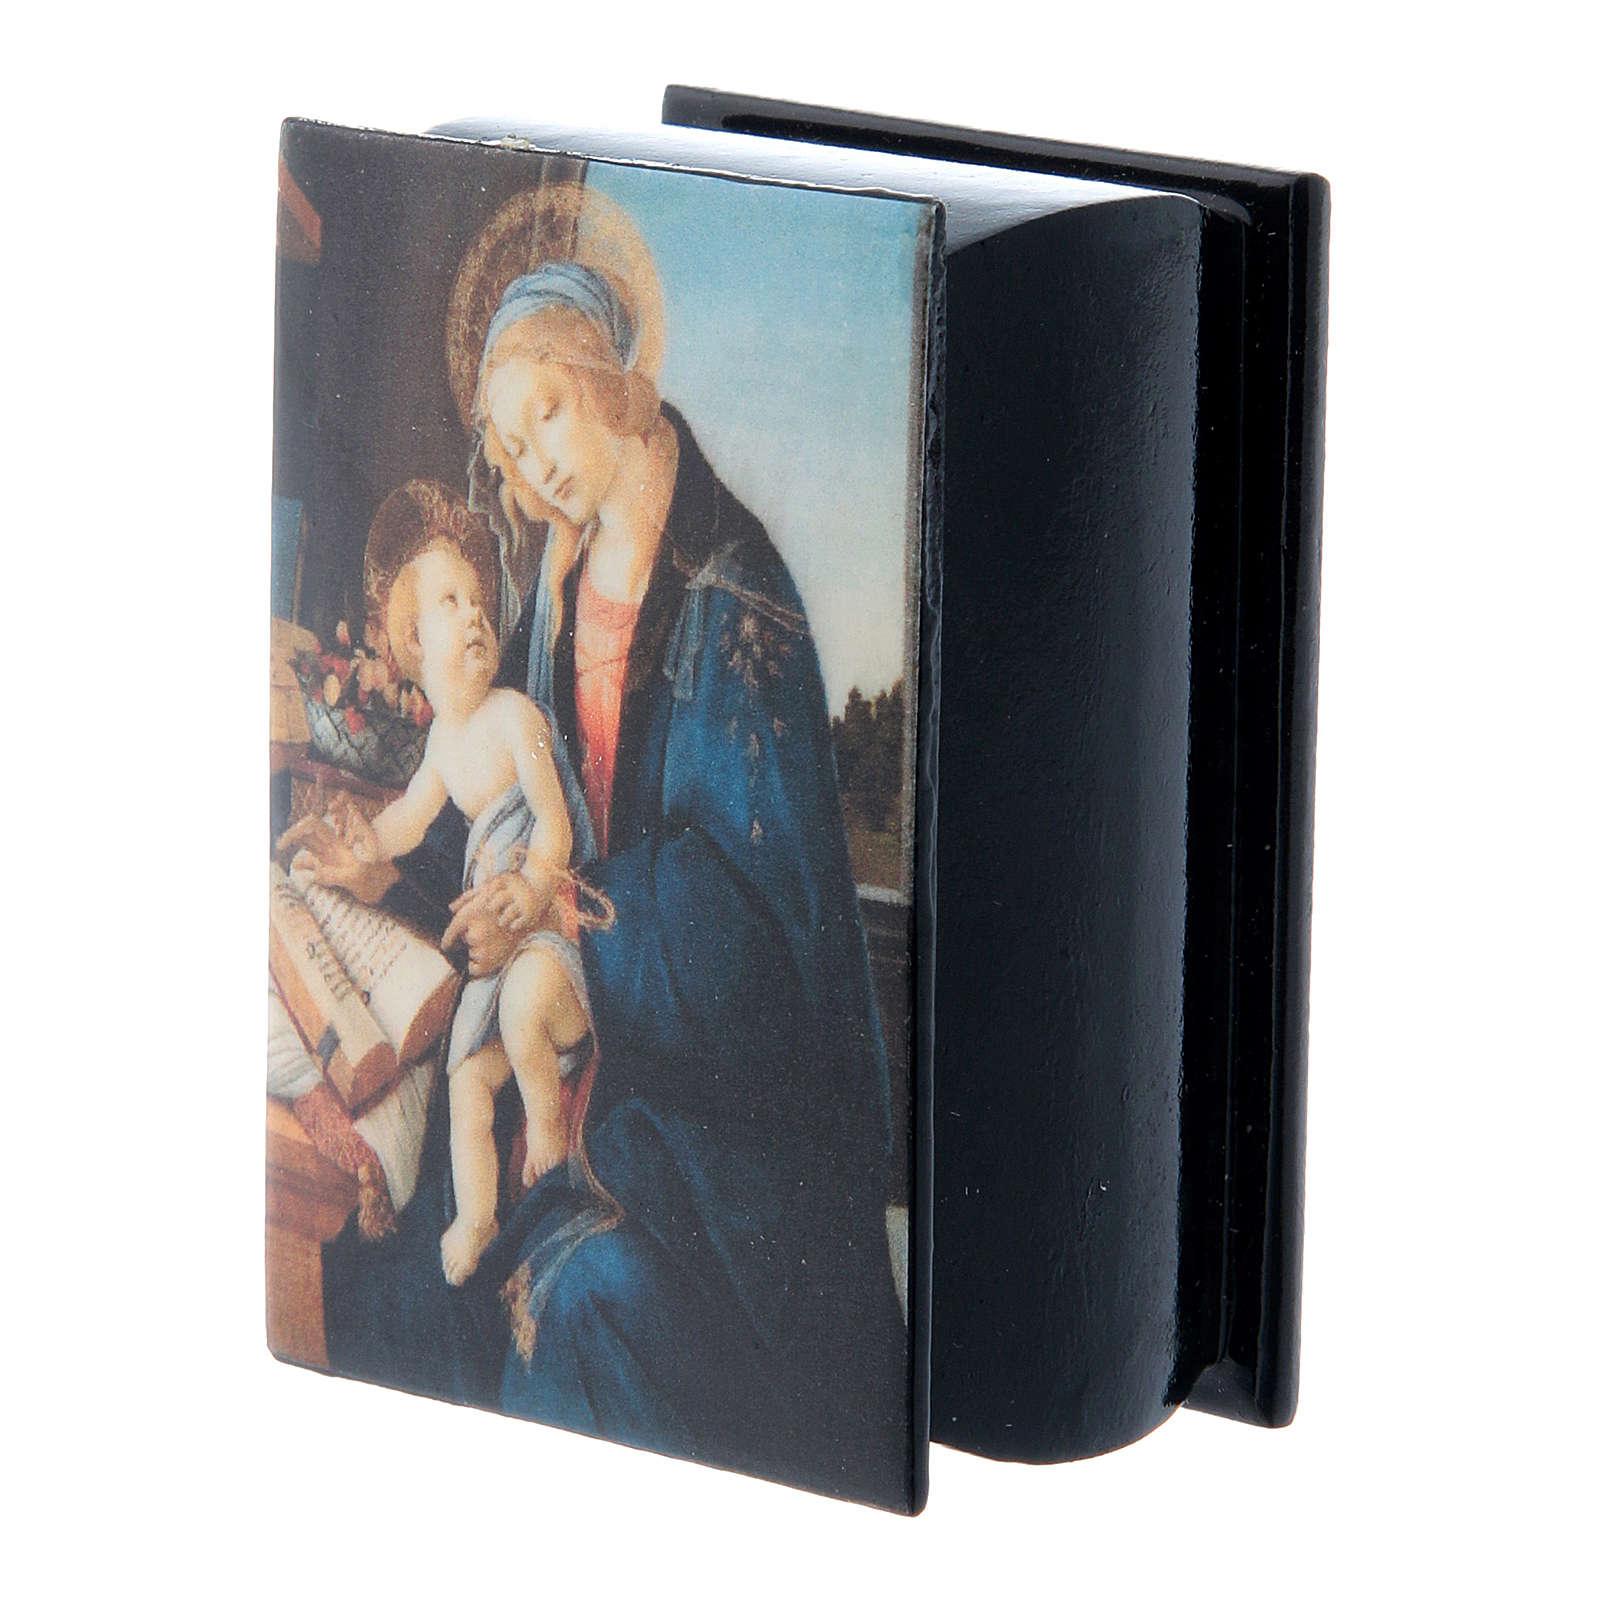 Caja papel maché rusa La Virgen del Libro 7x5 cm 4